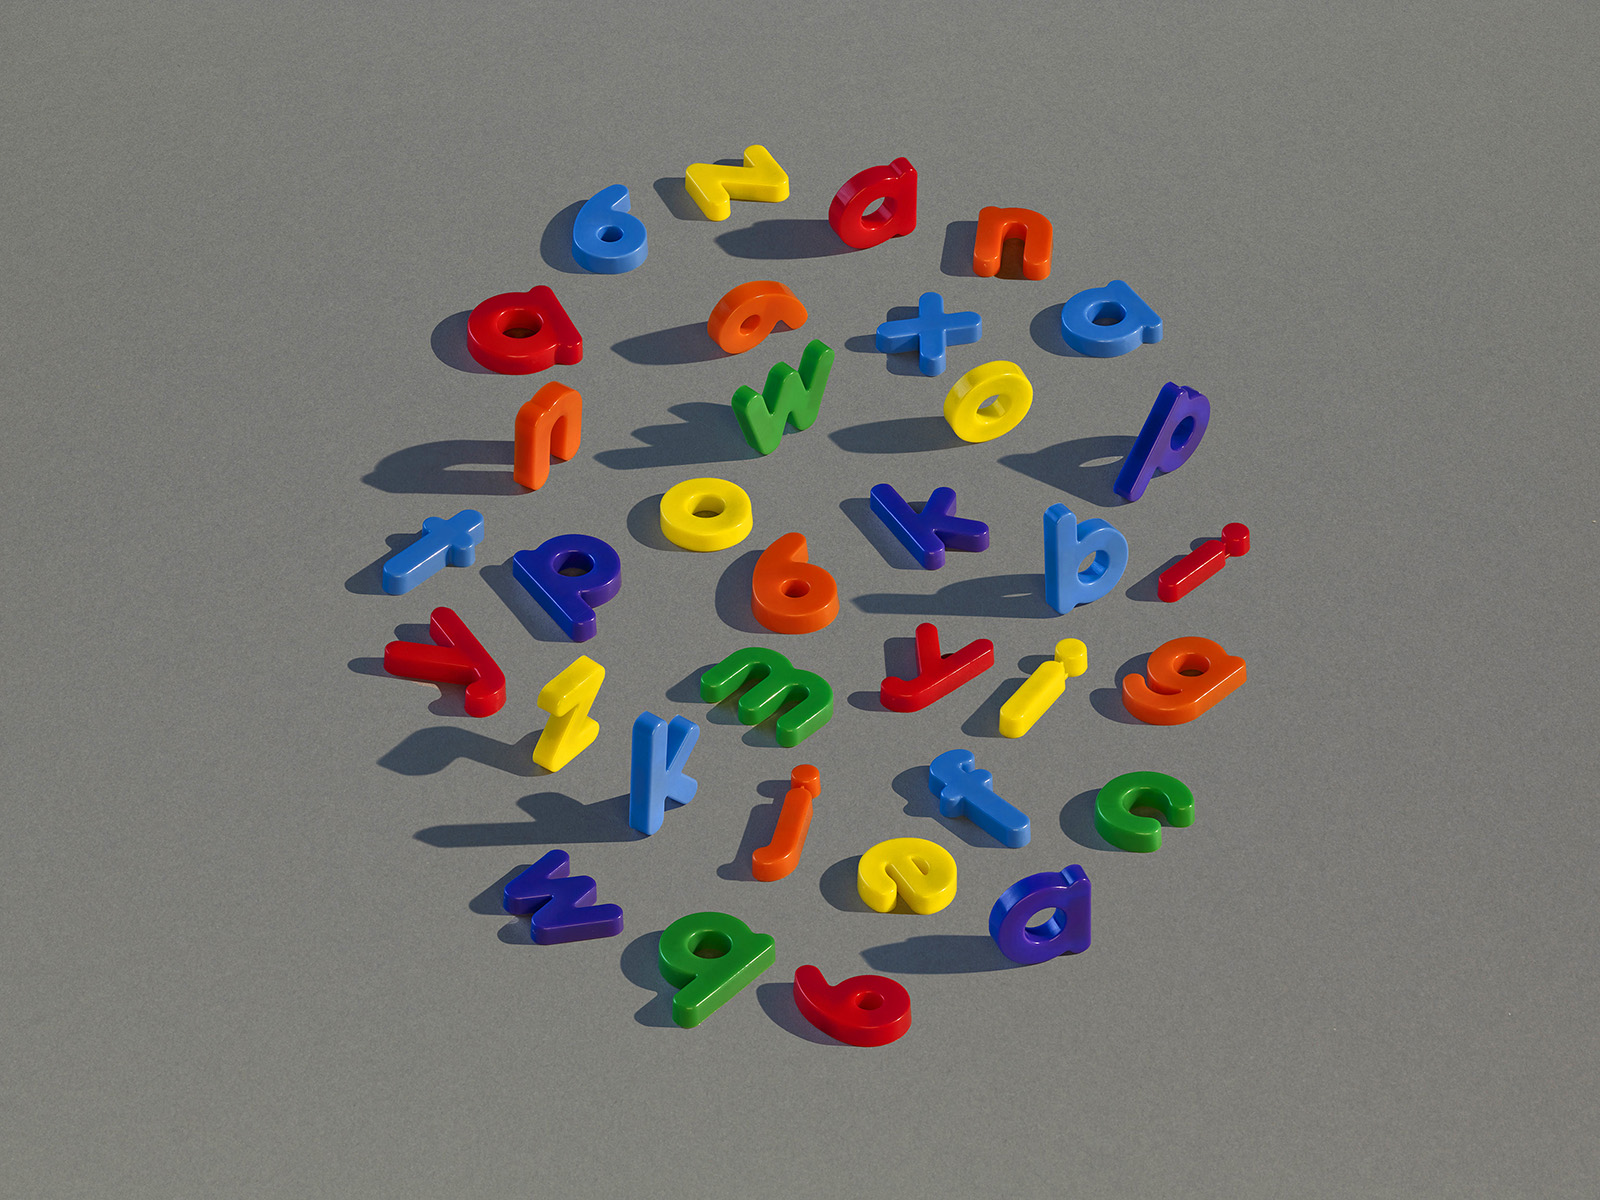 fridge-letters-numbers.jpg